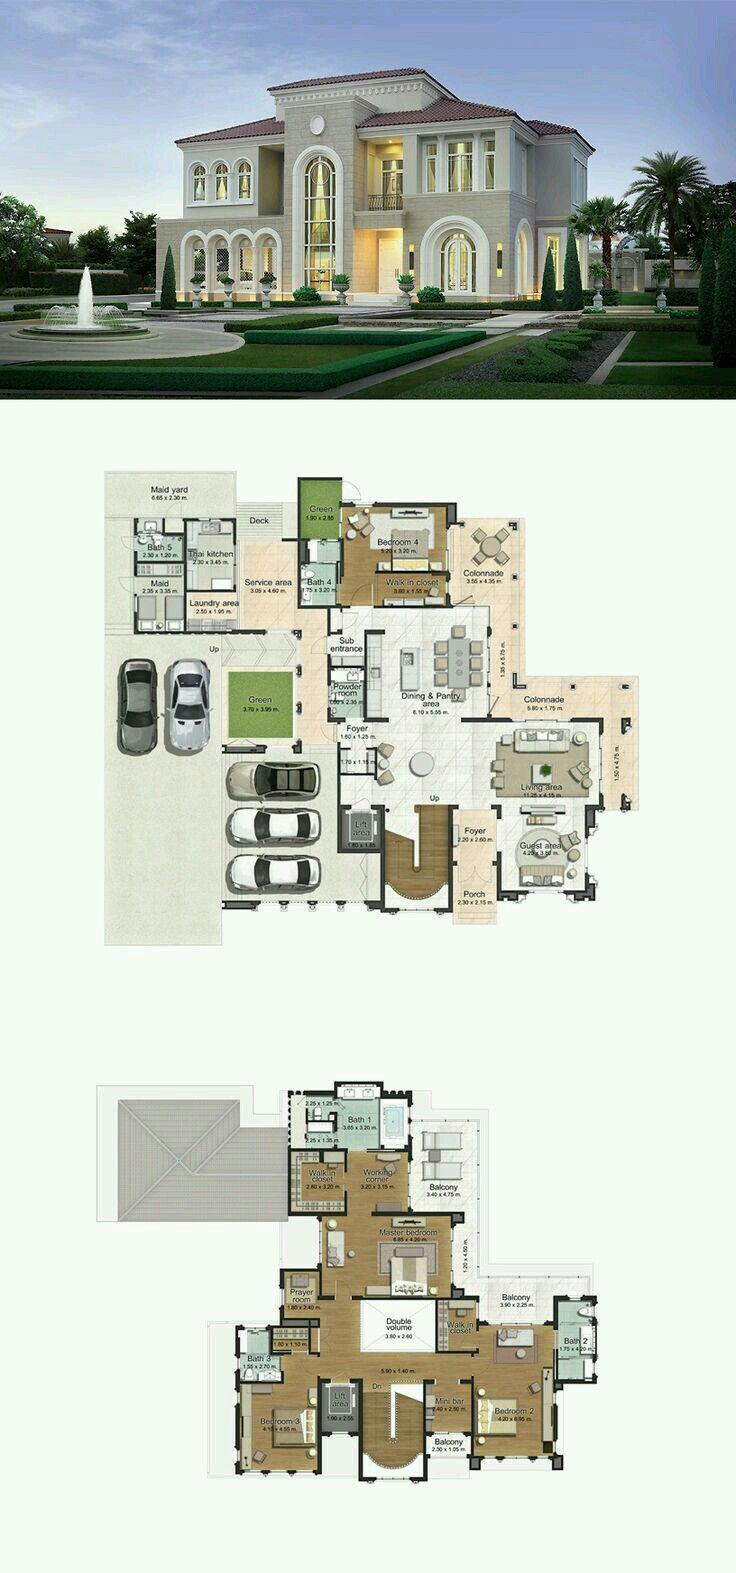 For Oahu architectural design visit httpownerbuiltdesigncom Great